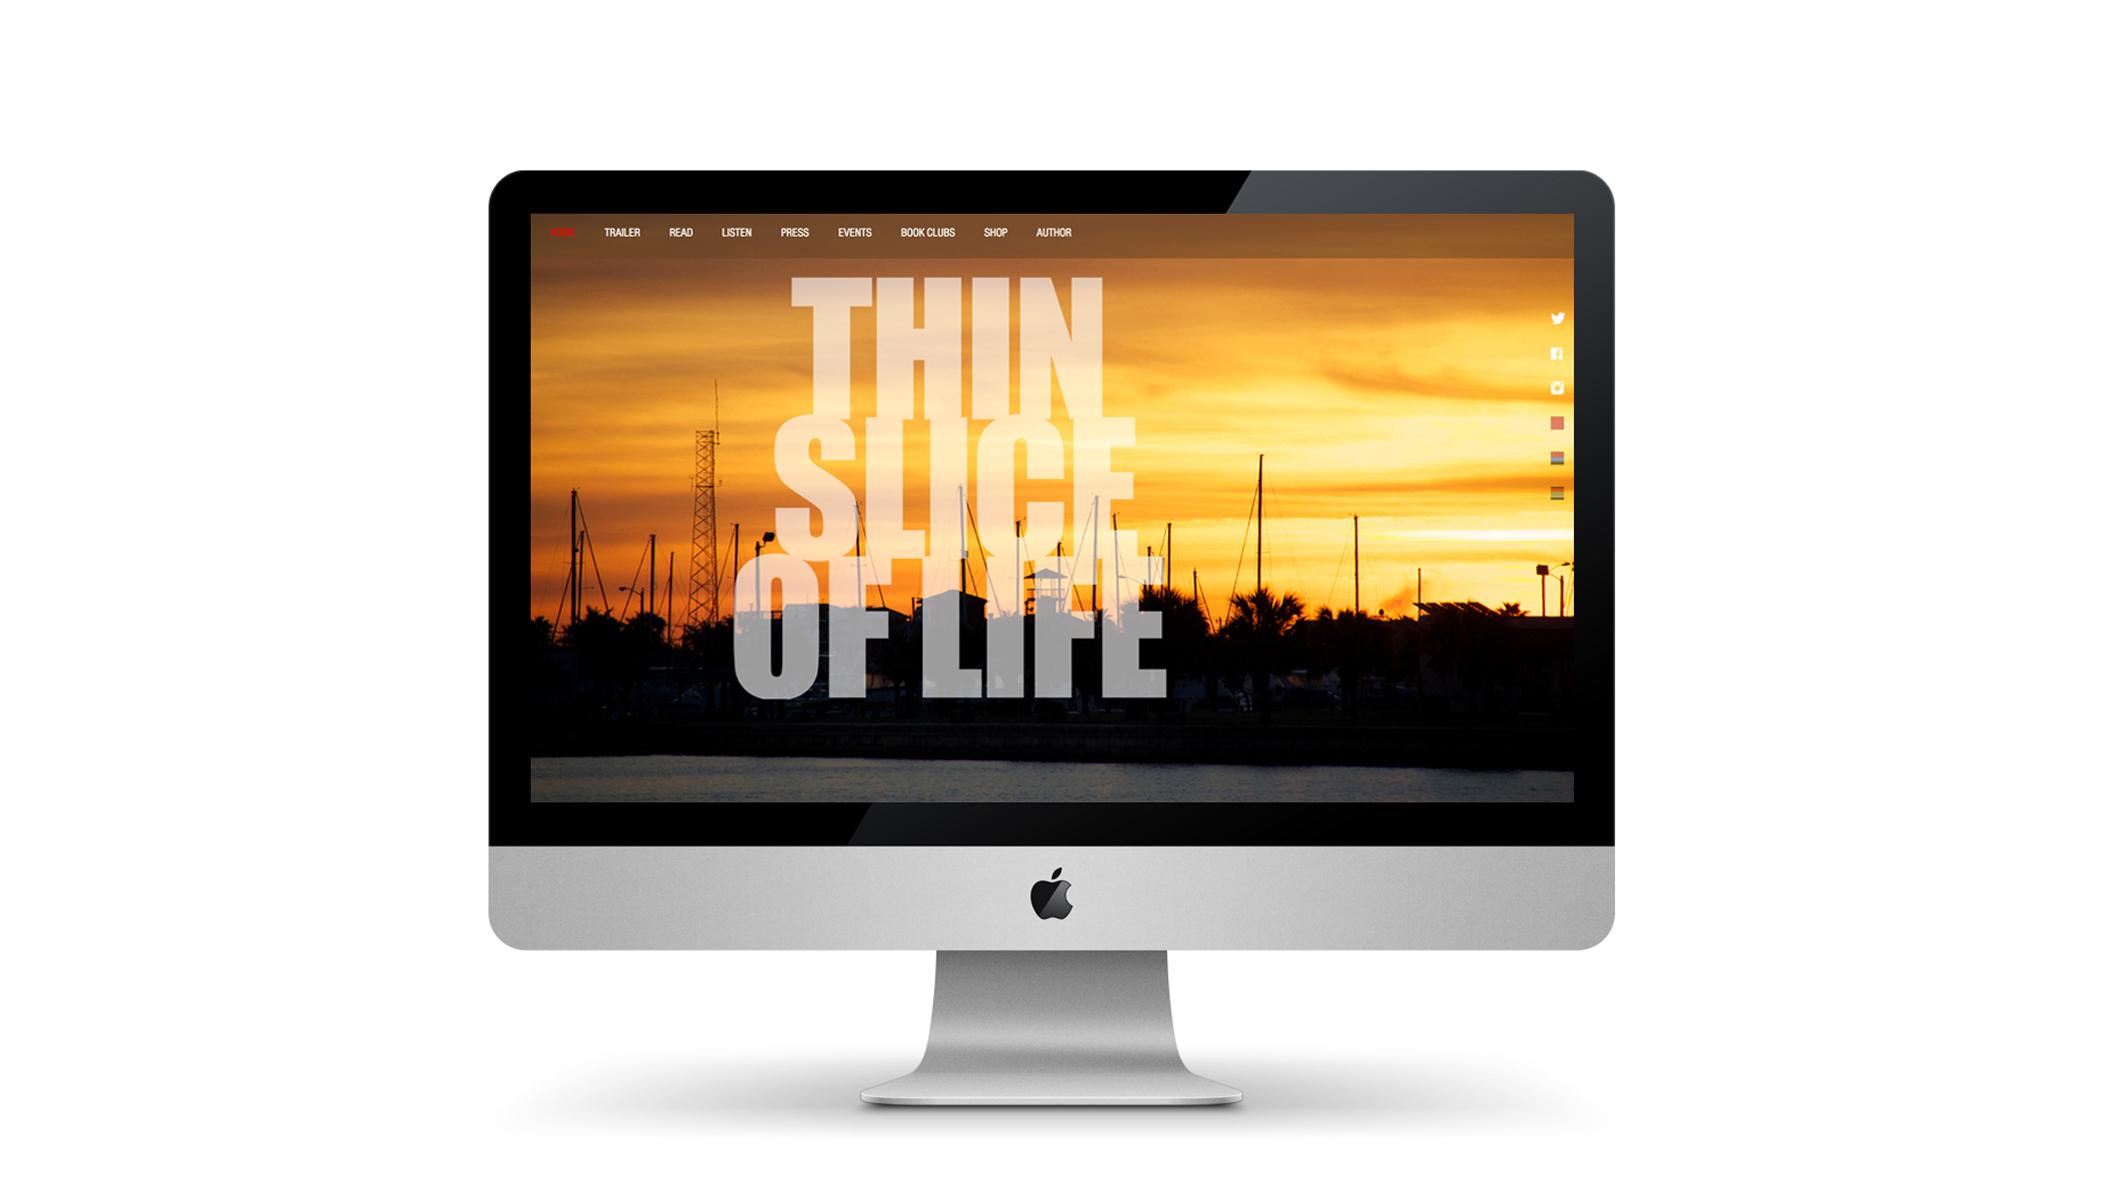 WEBSITE DESIGN & CODING: THIN SLICE of LIFE